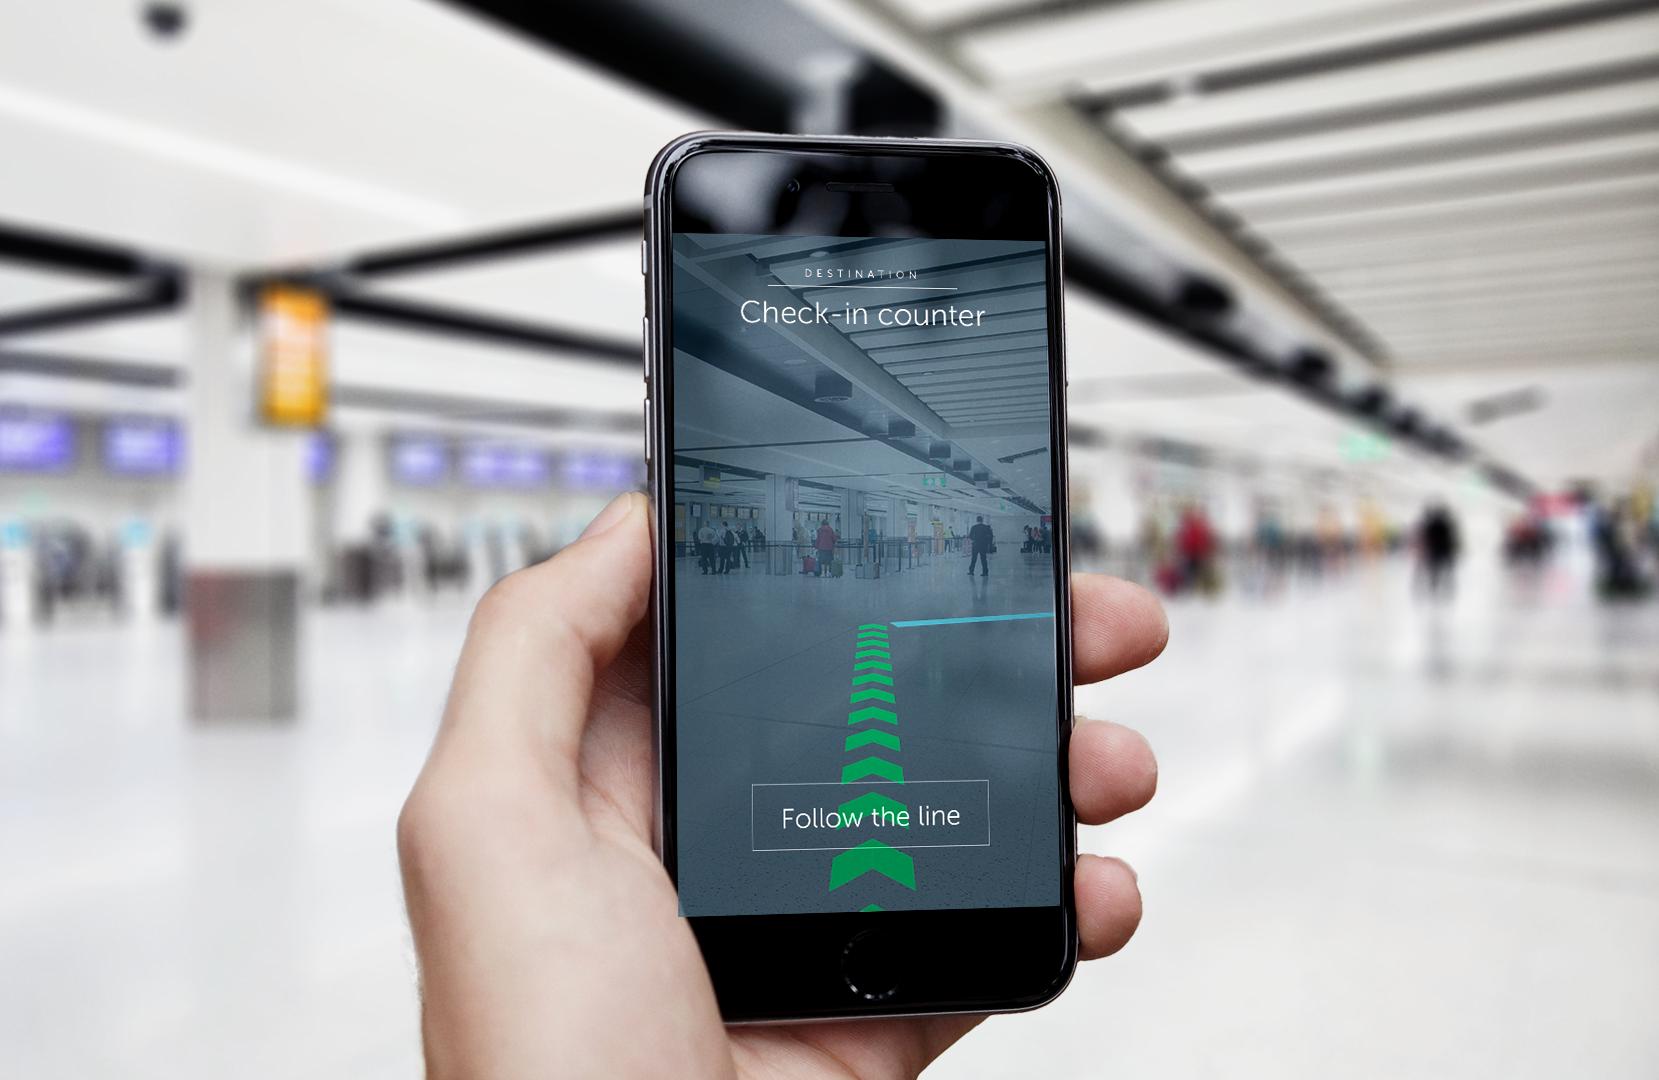 Microsoft fluent design system goran minov digital for Indoor navigation design